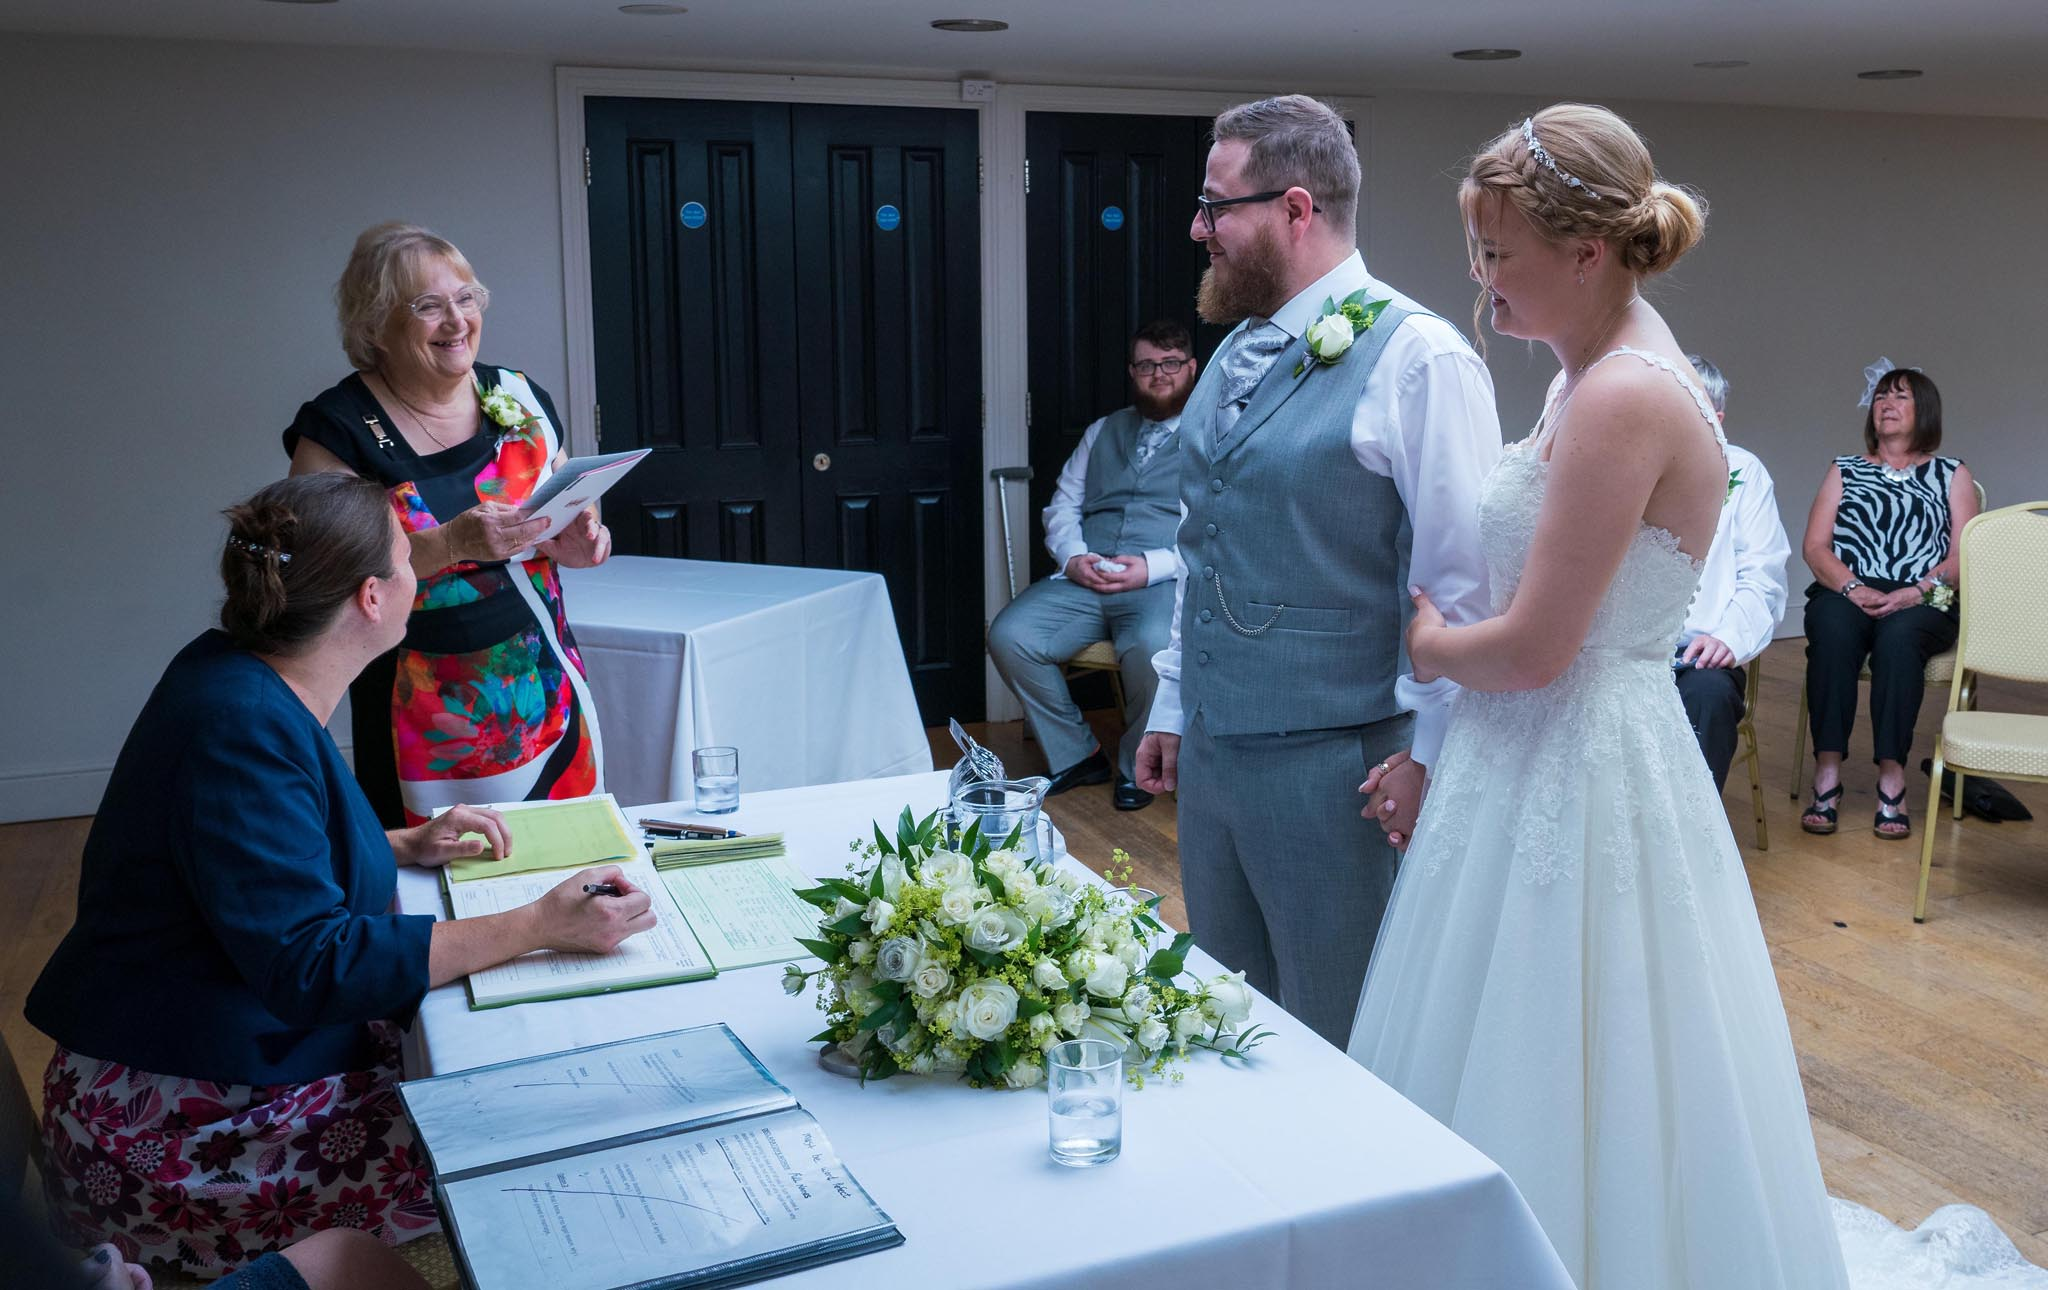 322-Ceremony-Luke-Yasmin-The-Rayleigh-Club-Wedding-Photography.jpg